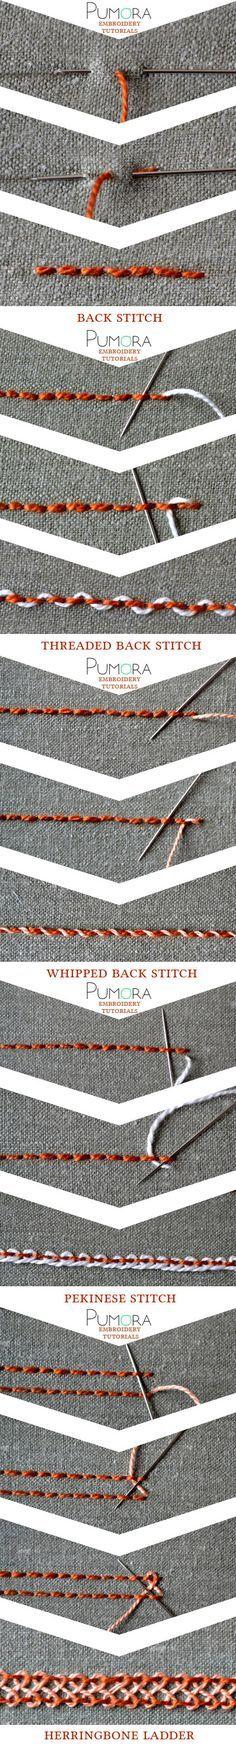 embroidery tutorials: backstitch with variations bordado, ricamo, broderie, sticken                                                                                                                                                                                 Más